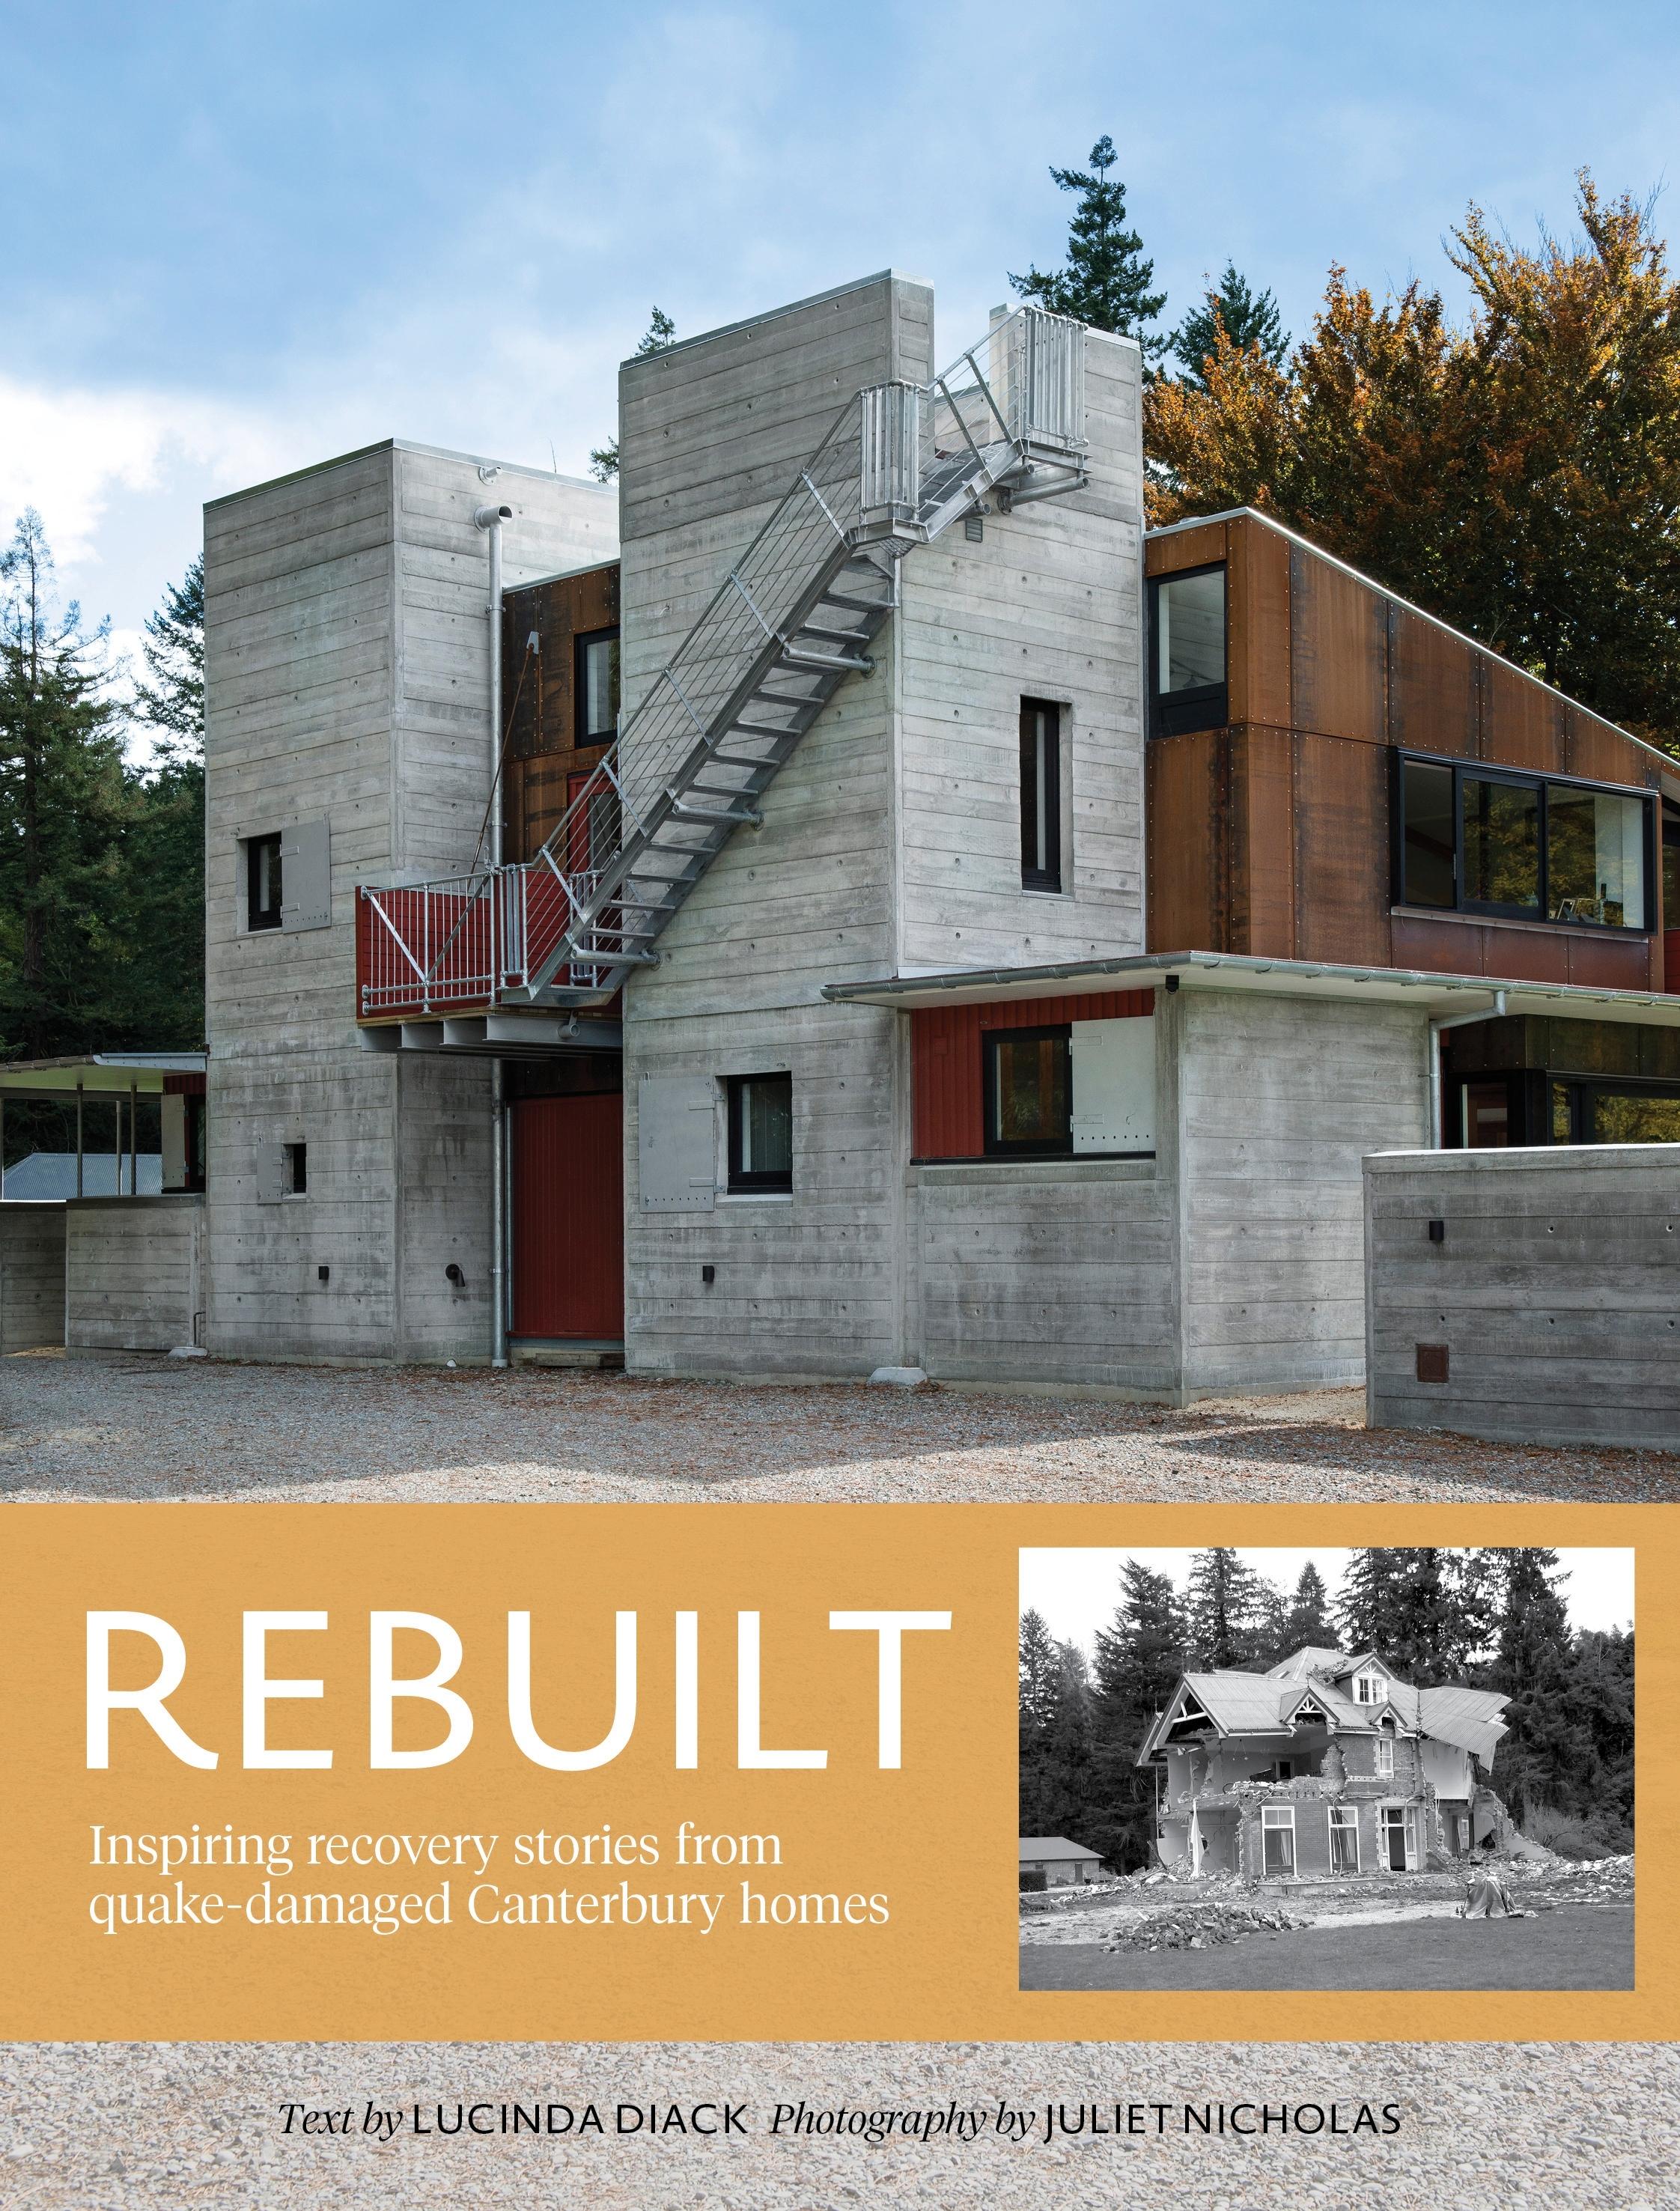 Rebuilt: Inspiring Recovery Stories From Quake-damaged Canterbury Homes Lucinda Diack